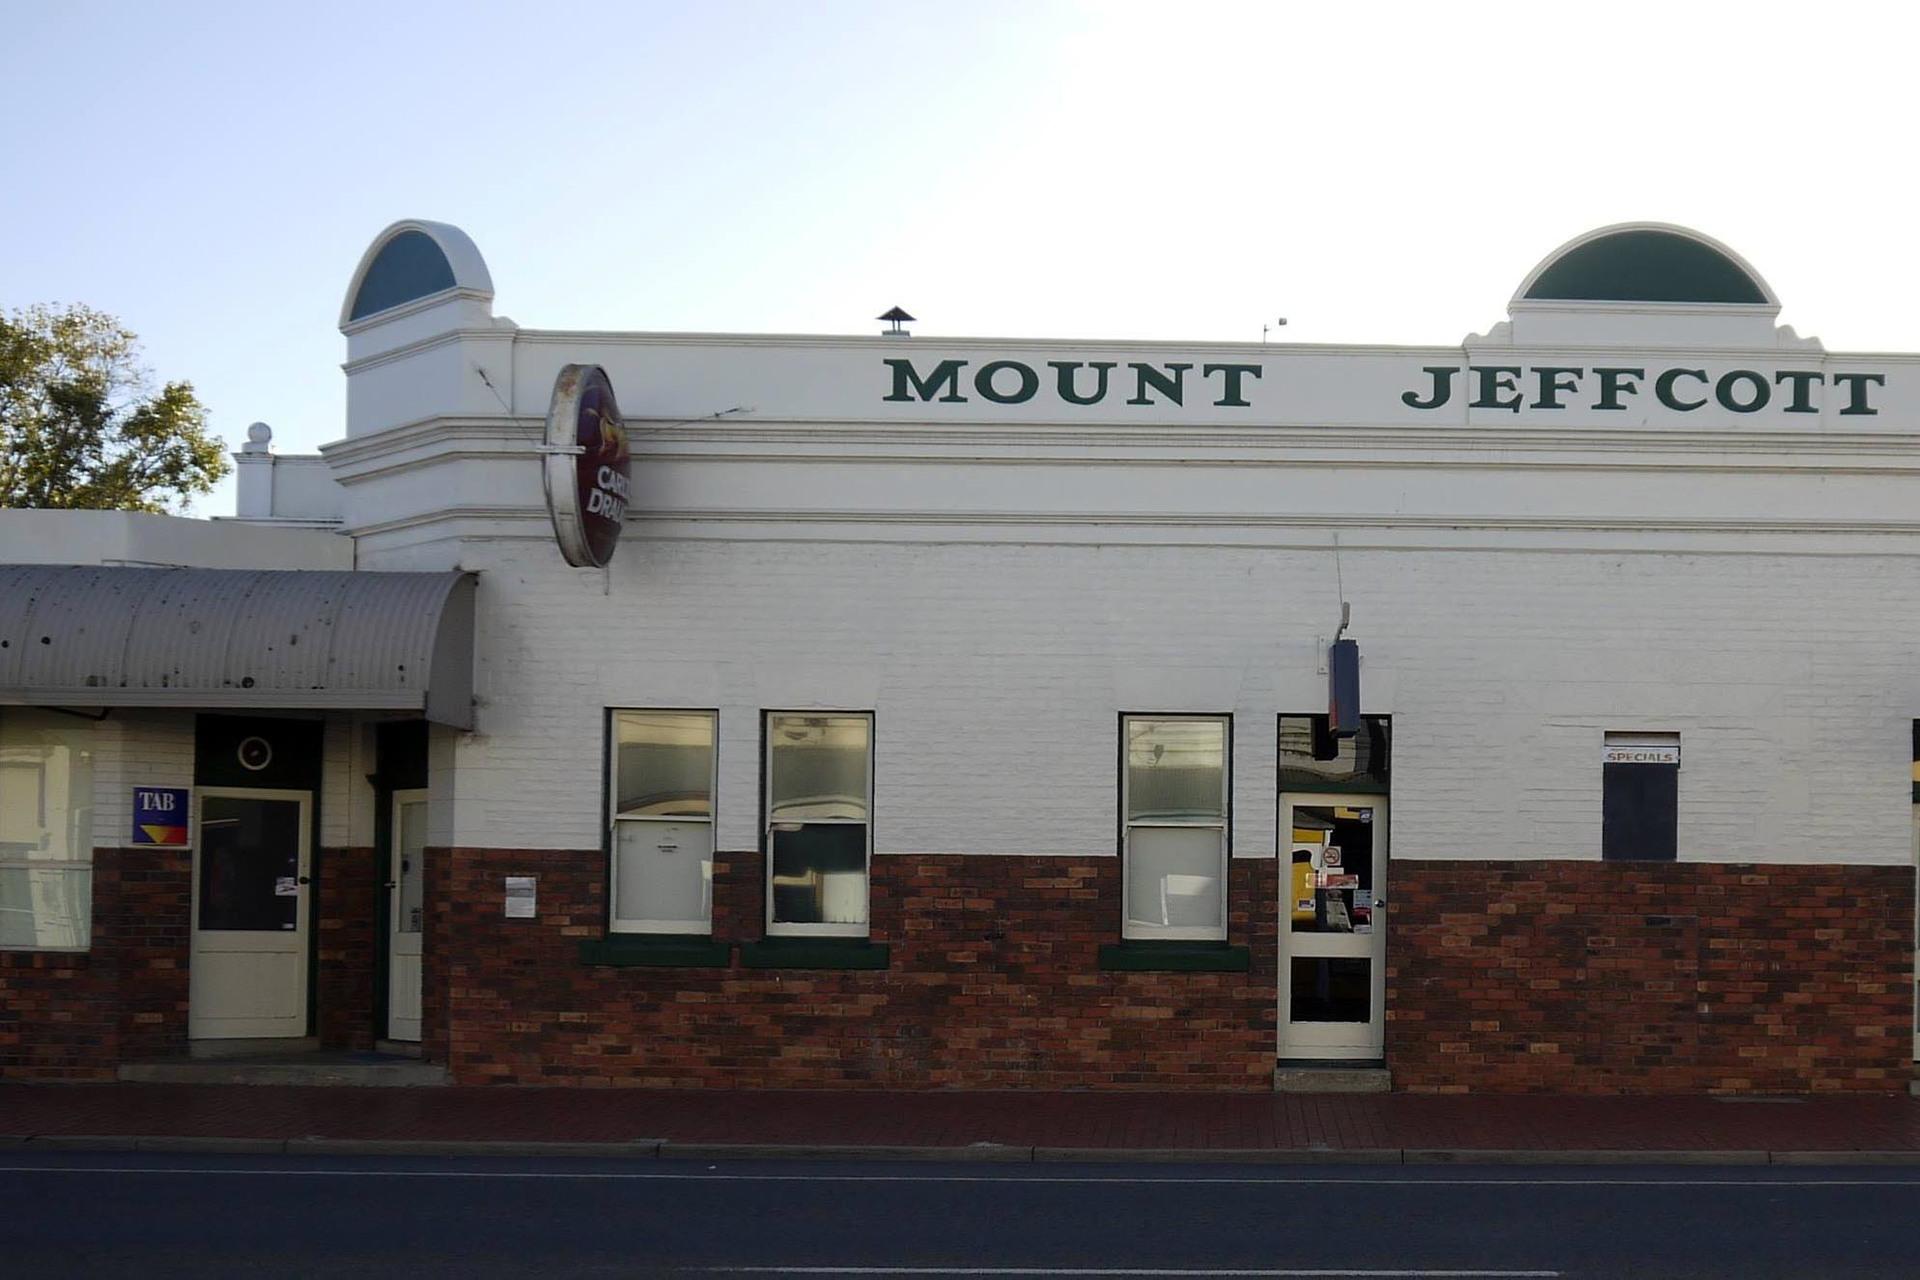 m - Mount Jeffcott Hotel